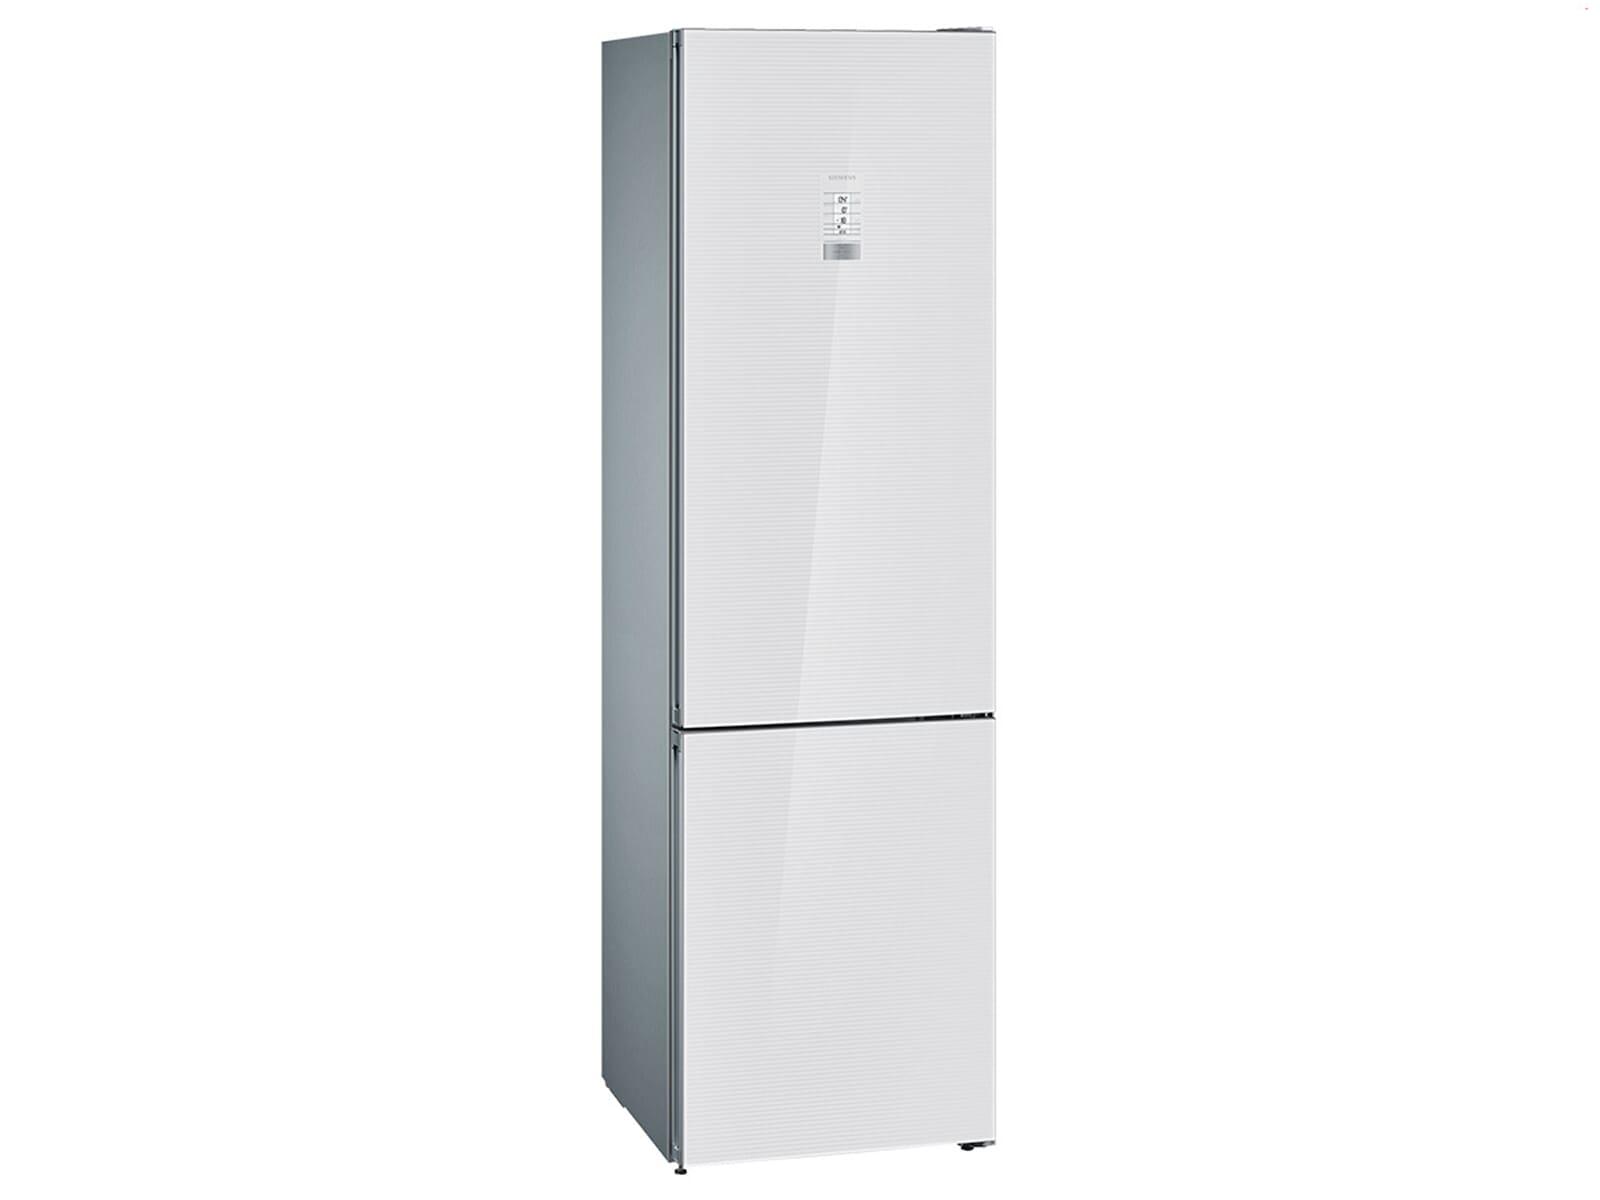 Siemens Kühlschrank Weiß : Siemens kühlschrank gefrierkombi siemens kg nxb kühl